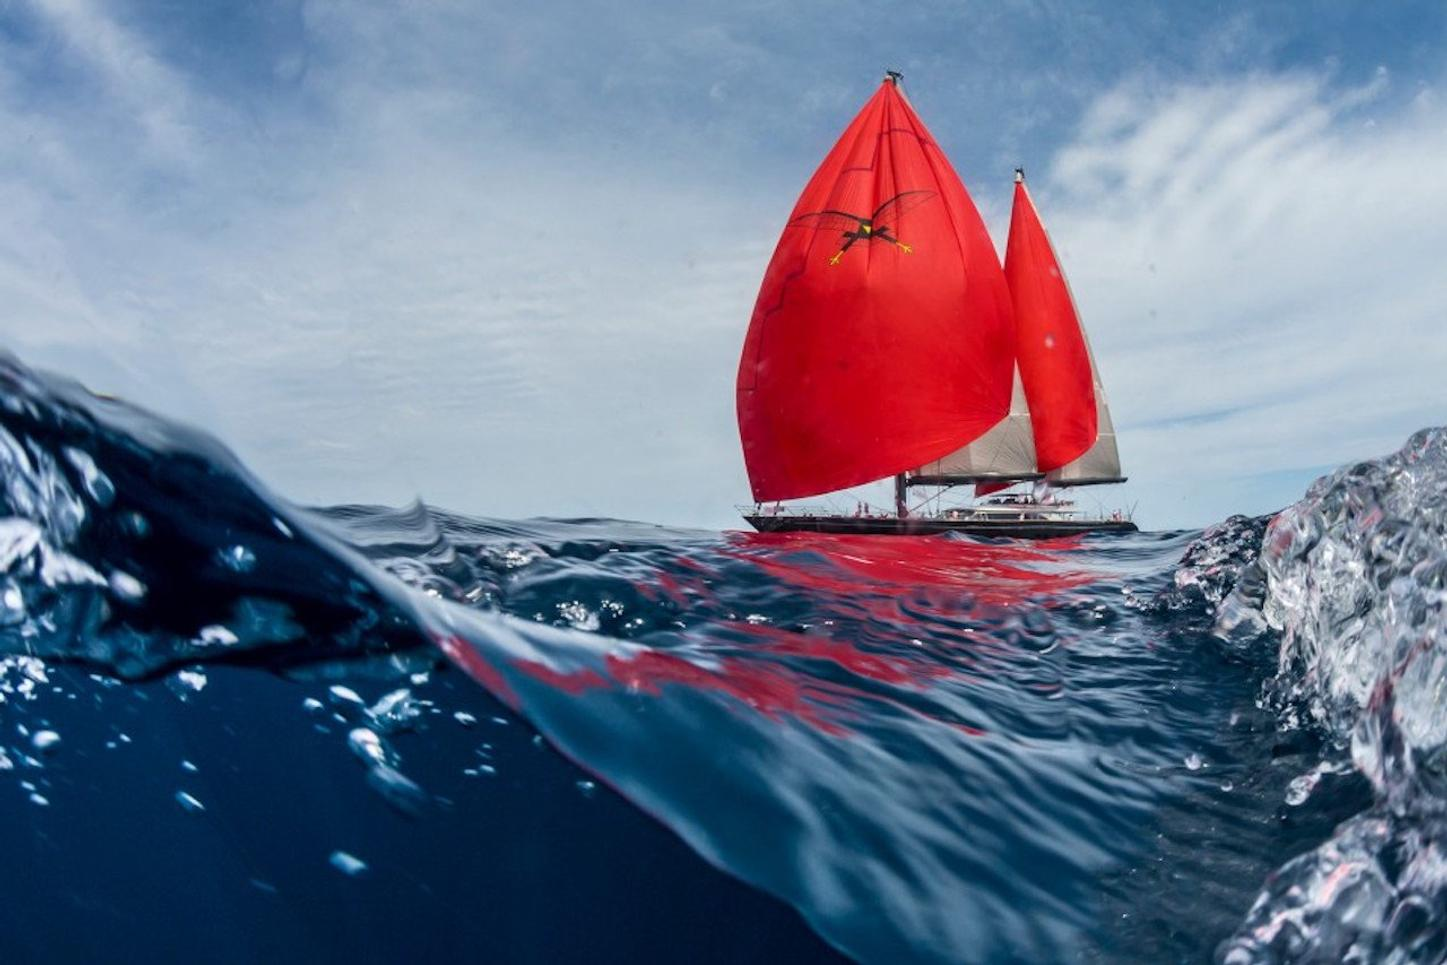 sailing yacht SEAHAWK underway on a Caribbean yacht charter